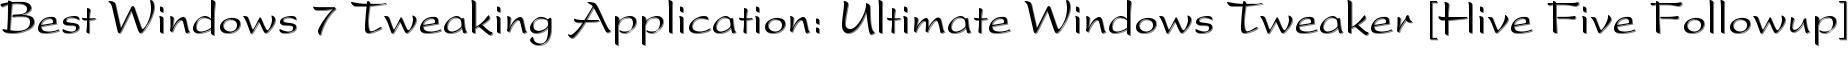 Best Windows 7 Tweaking Application: Ultimate Windows Tweaker [Hive Five Followup]